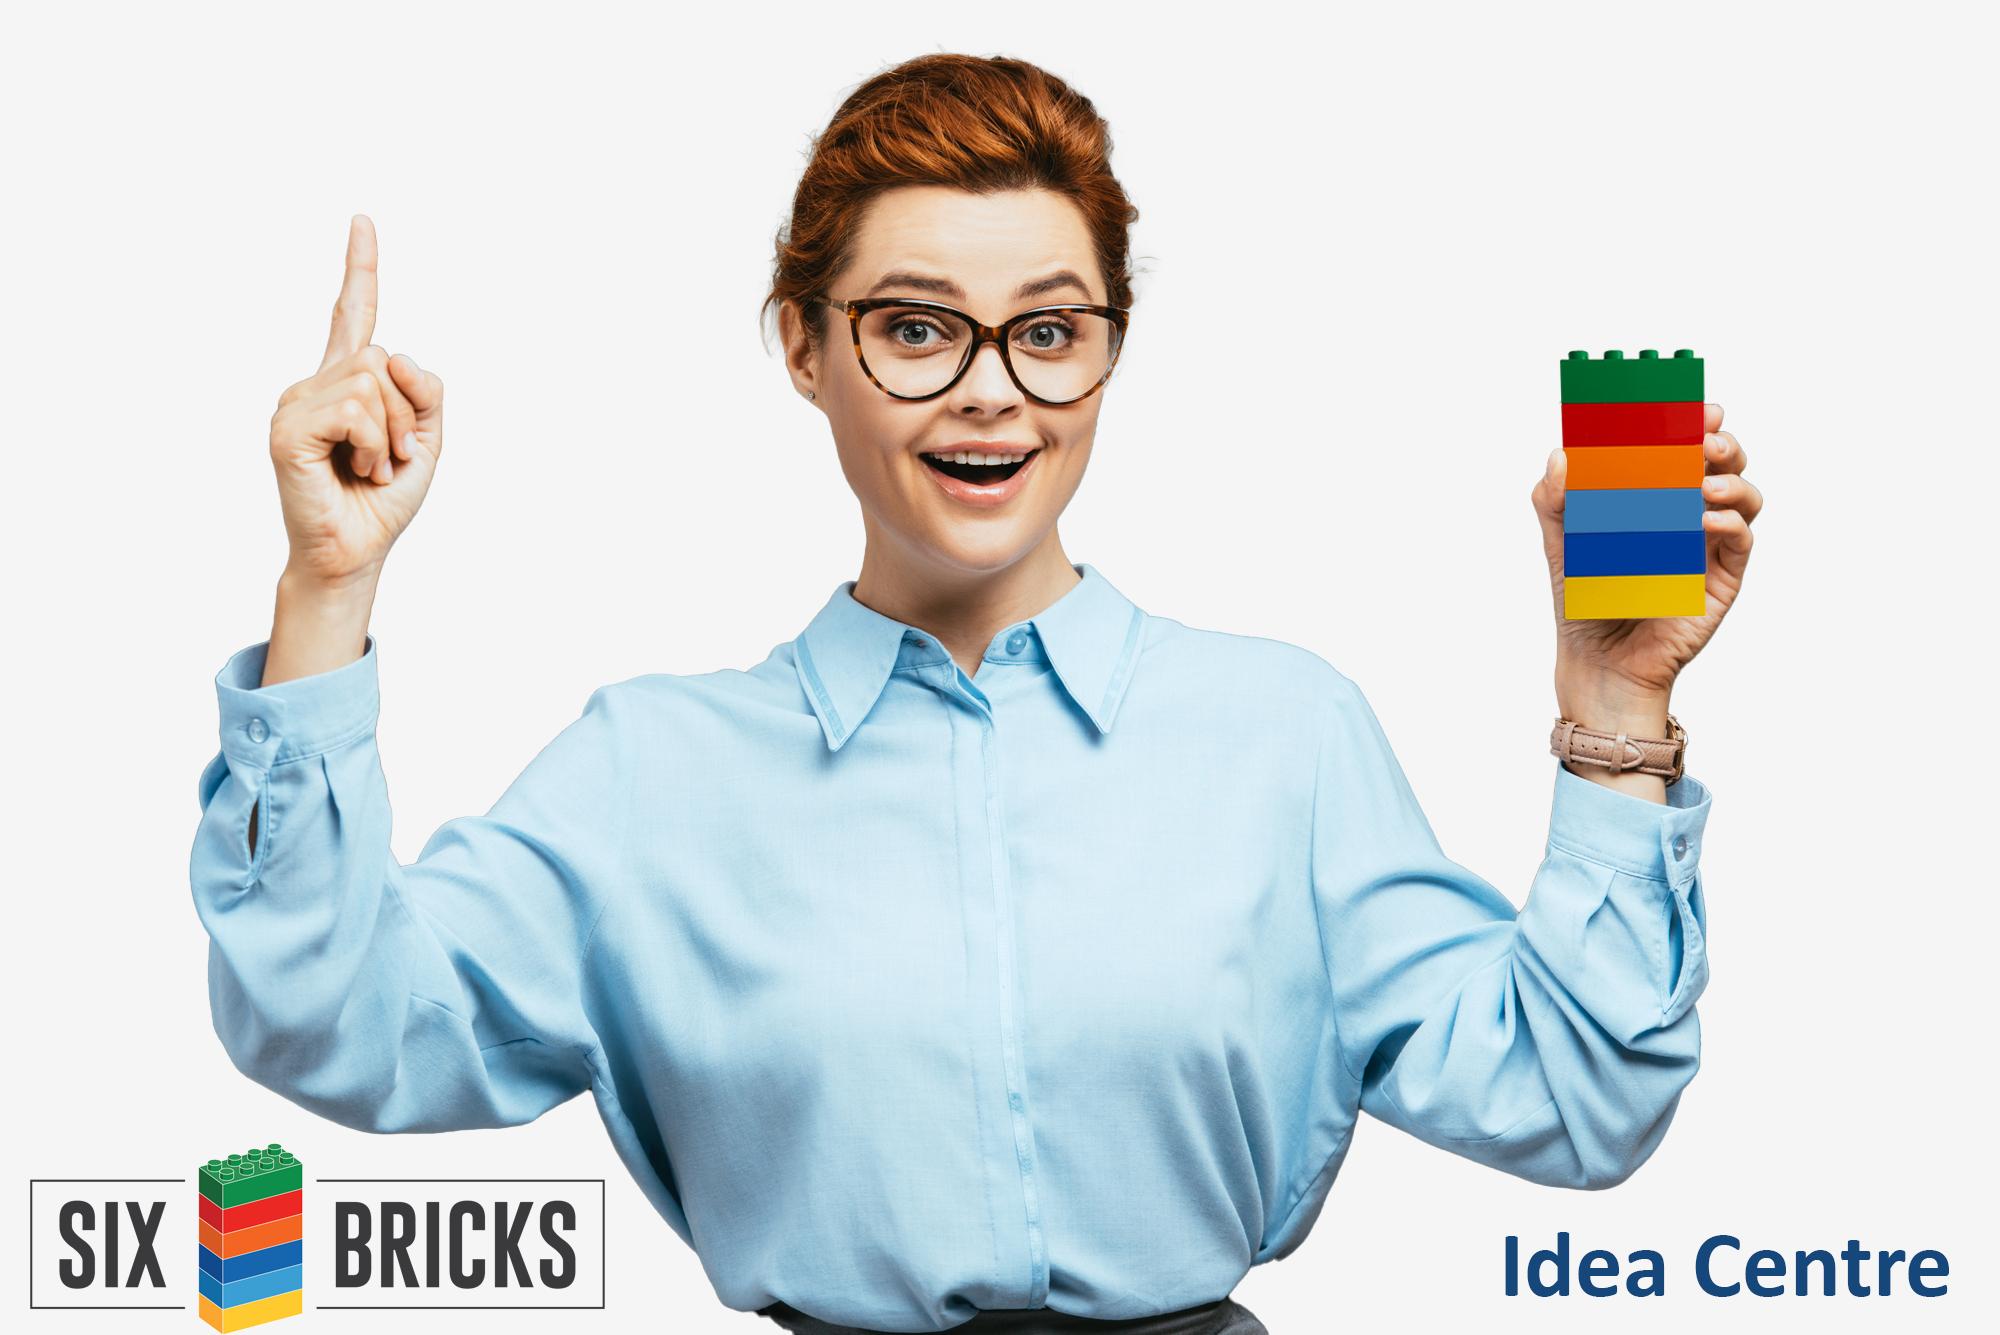 Six Bricks Idea Centre